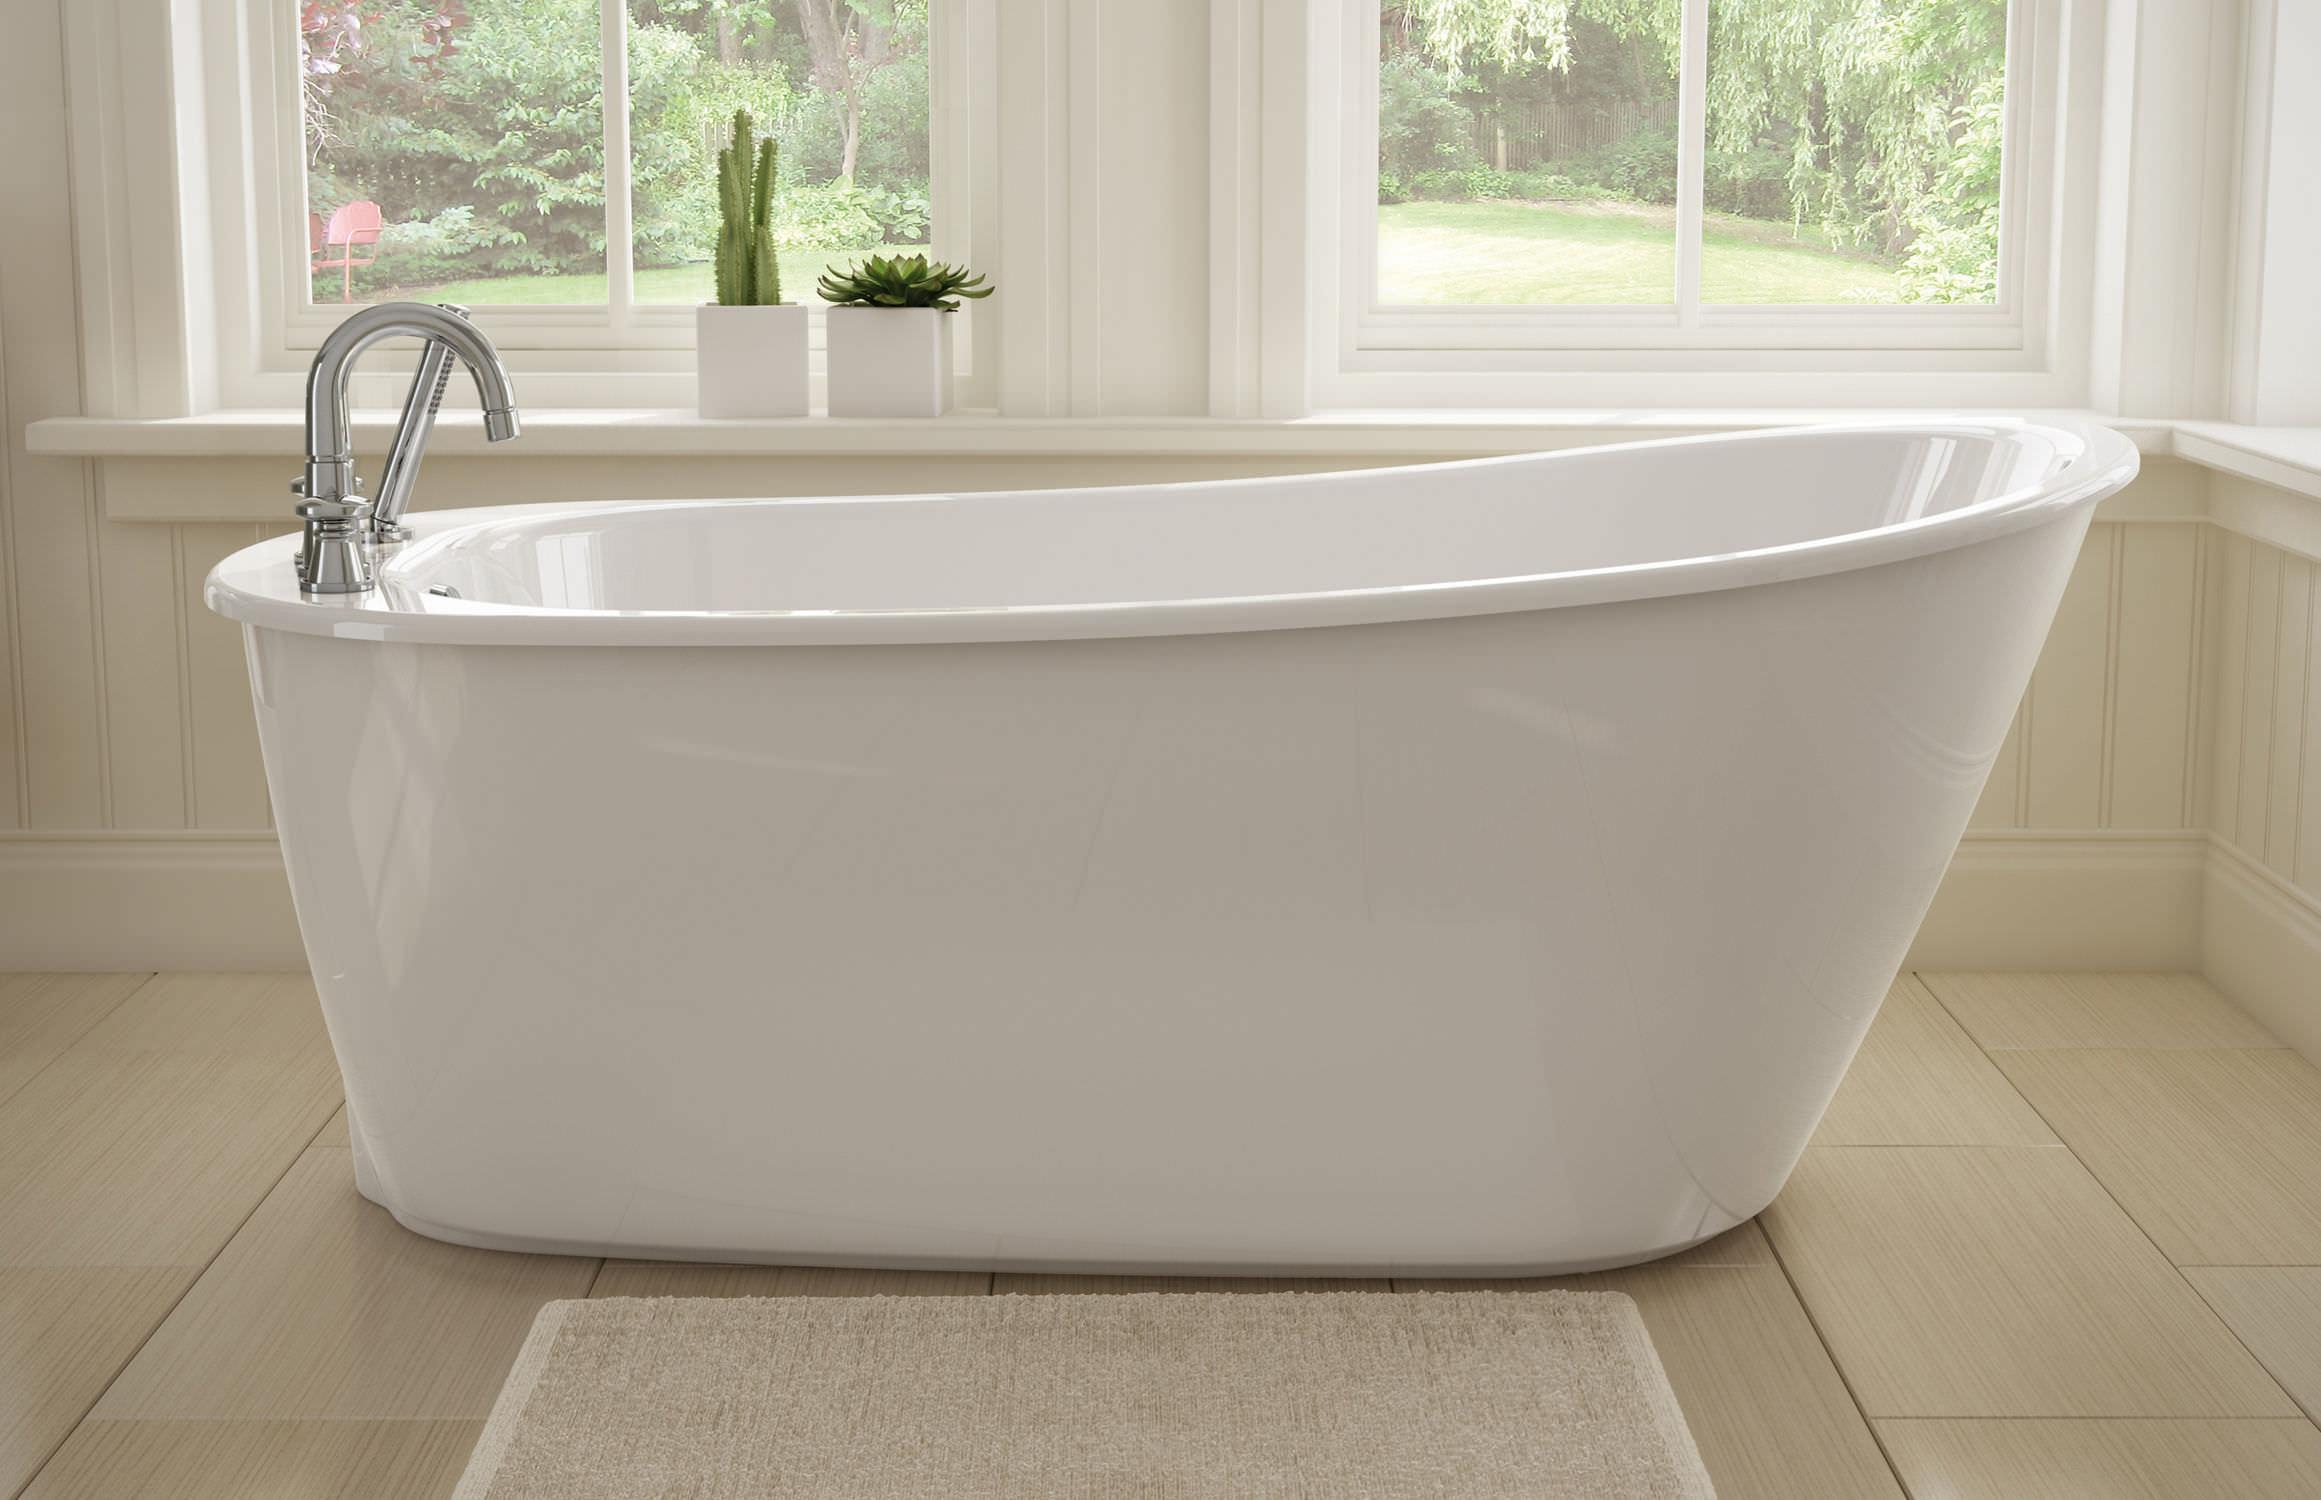 Freestanding Bathtub Sax Maax Bathroom Oval Acrylic White